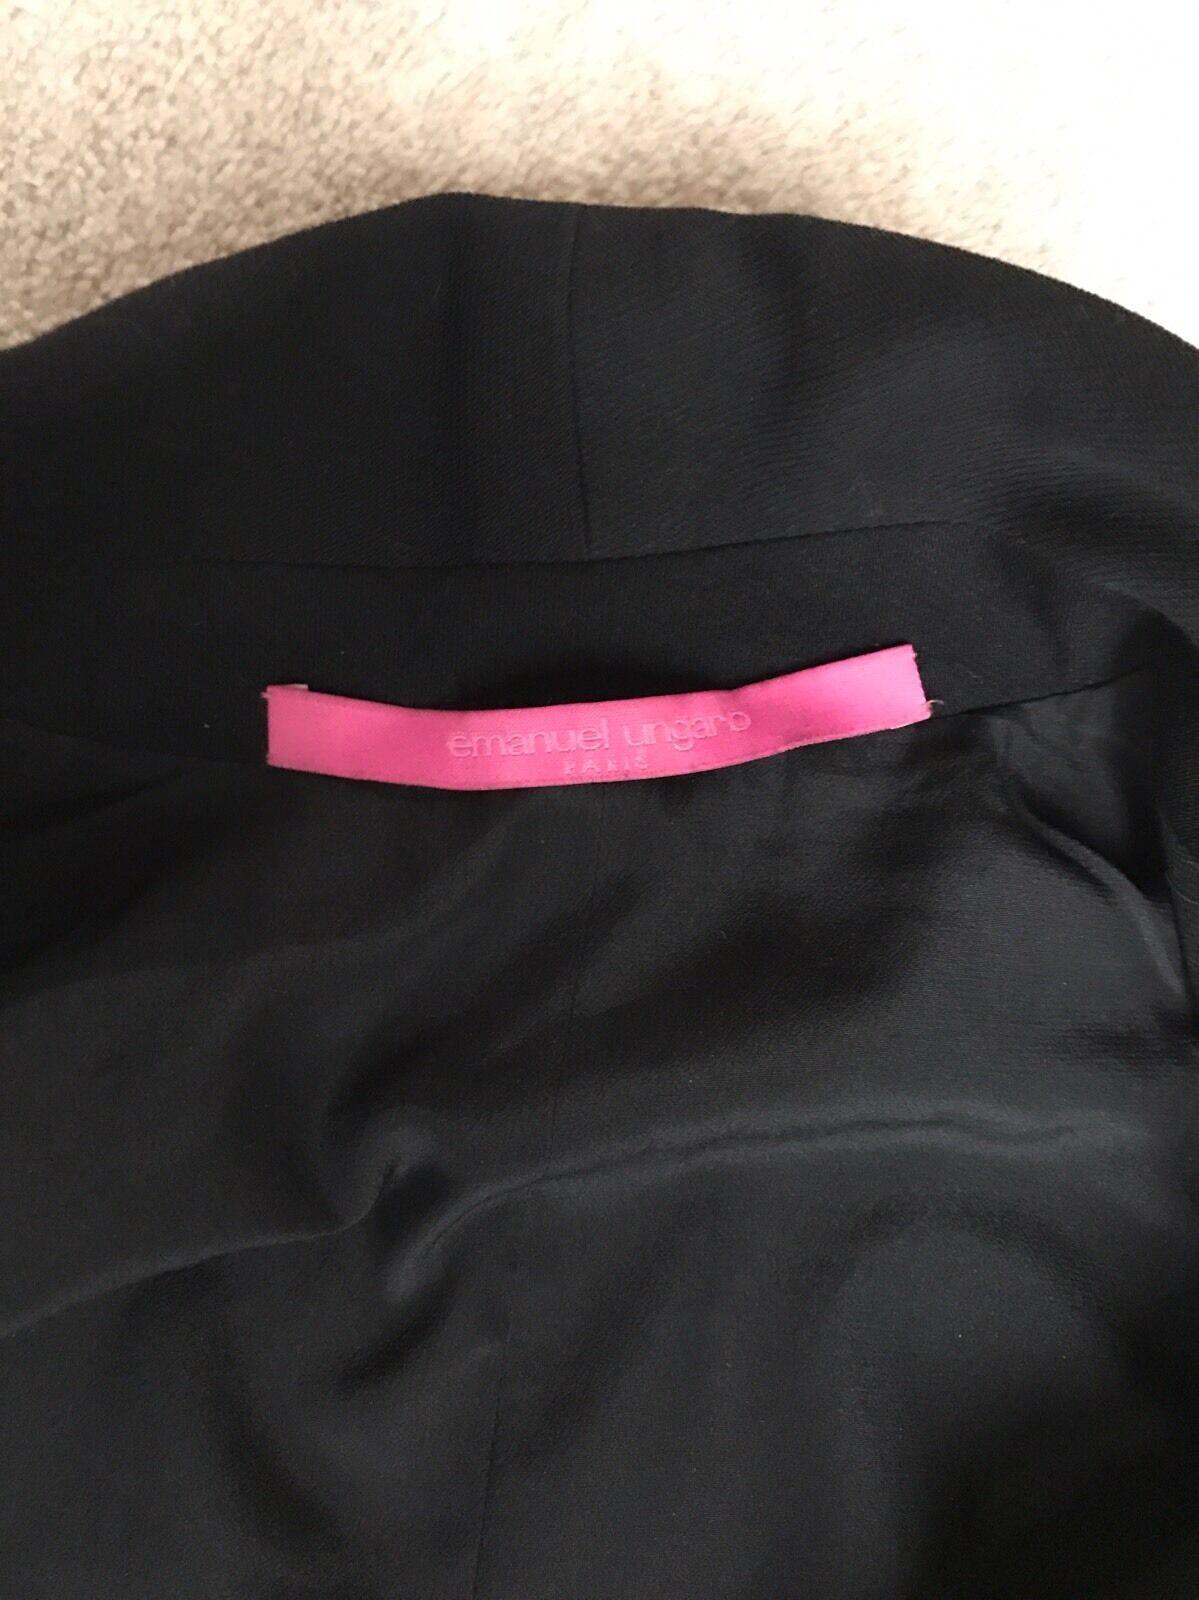 Emanuel Ungaro Giacca, Giacca, Giacca, 100% pura lana, s36 Pantaloni abbinati disponibili b559f2